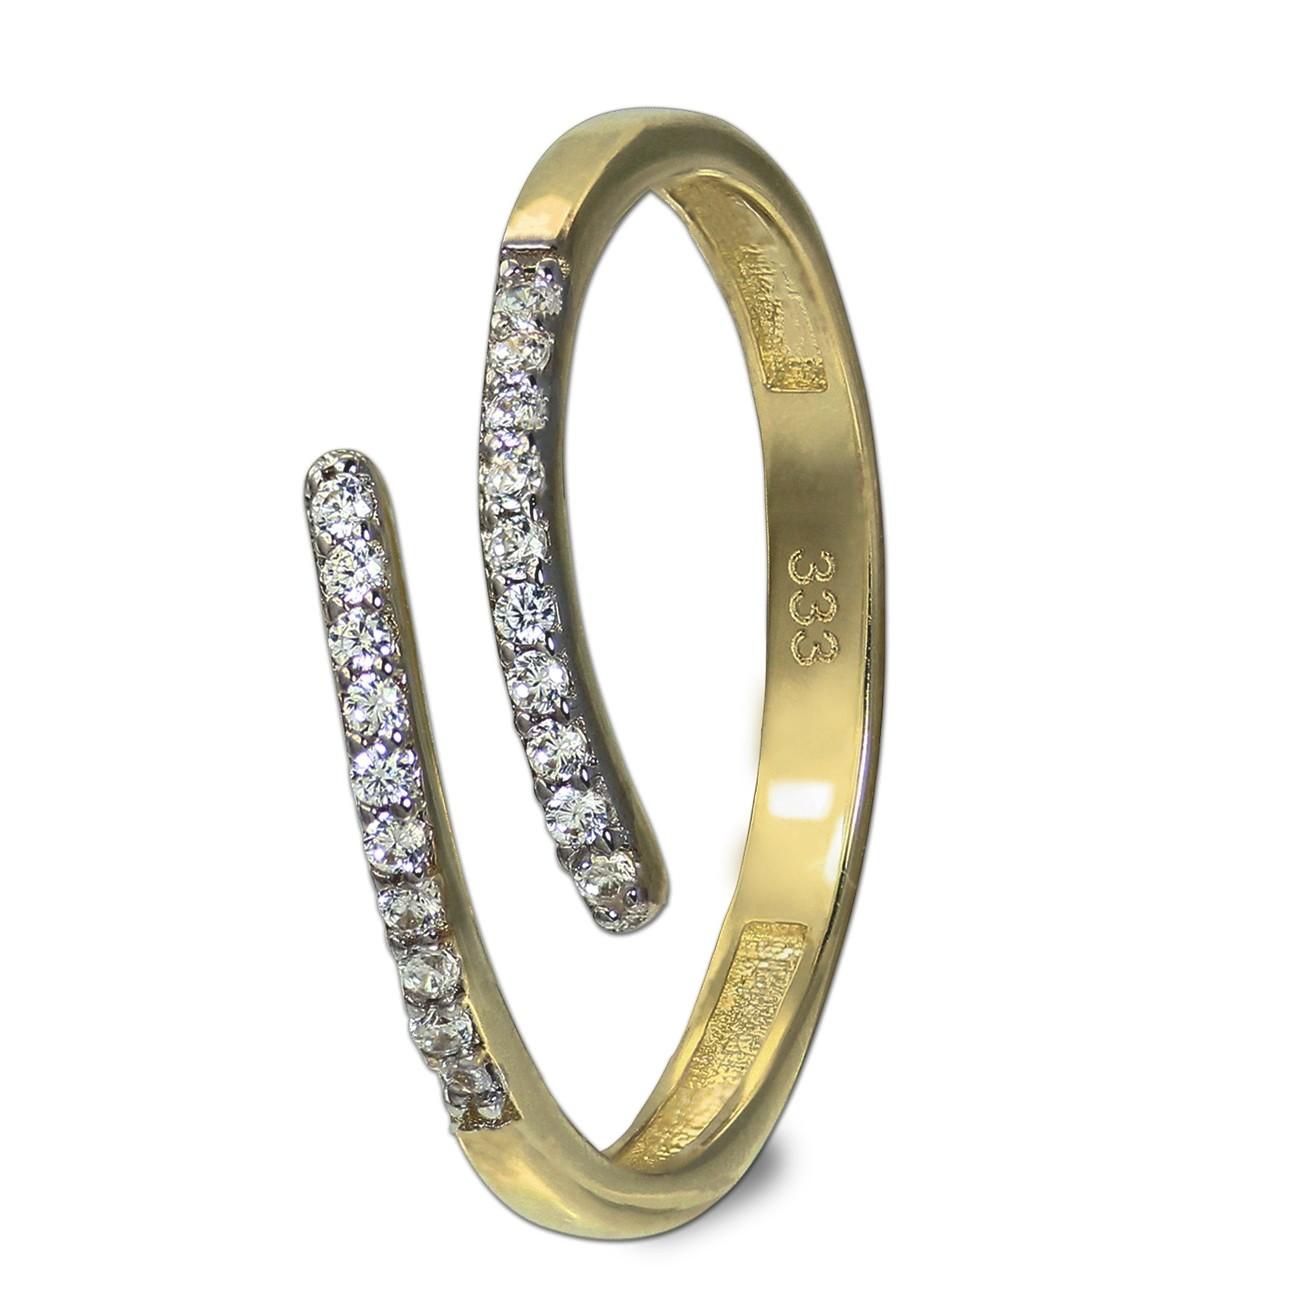 GoldDream Gold Ring Gr.58 Line Zirkonia weiß 333er Gelbgold GDR524Y58